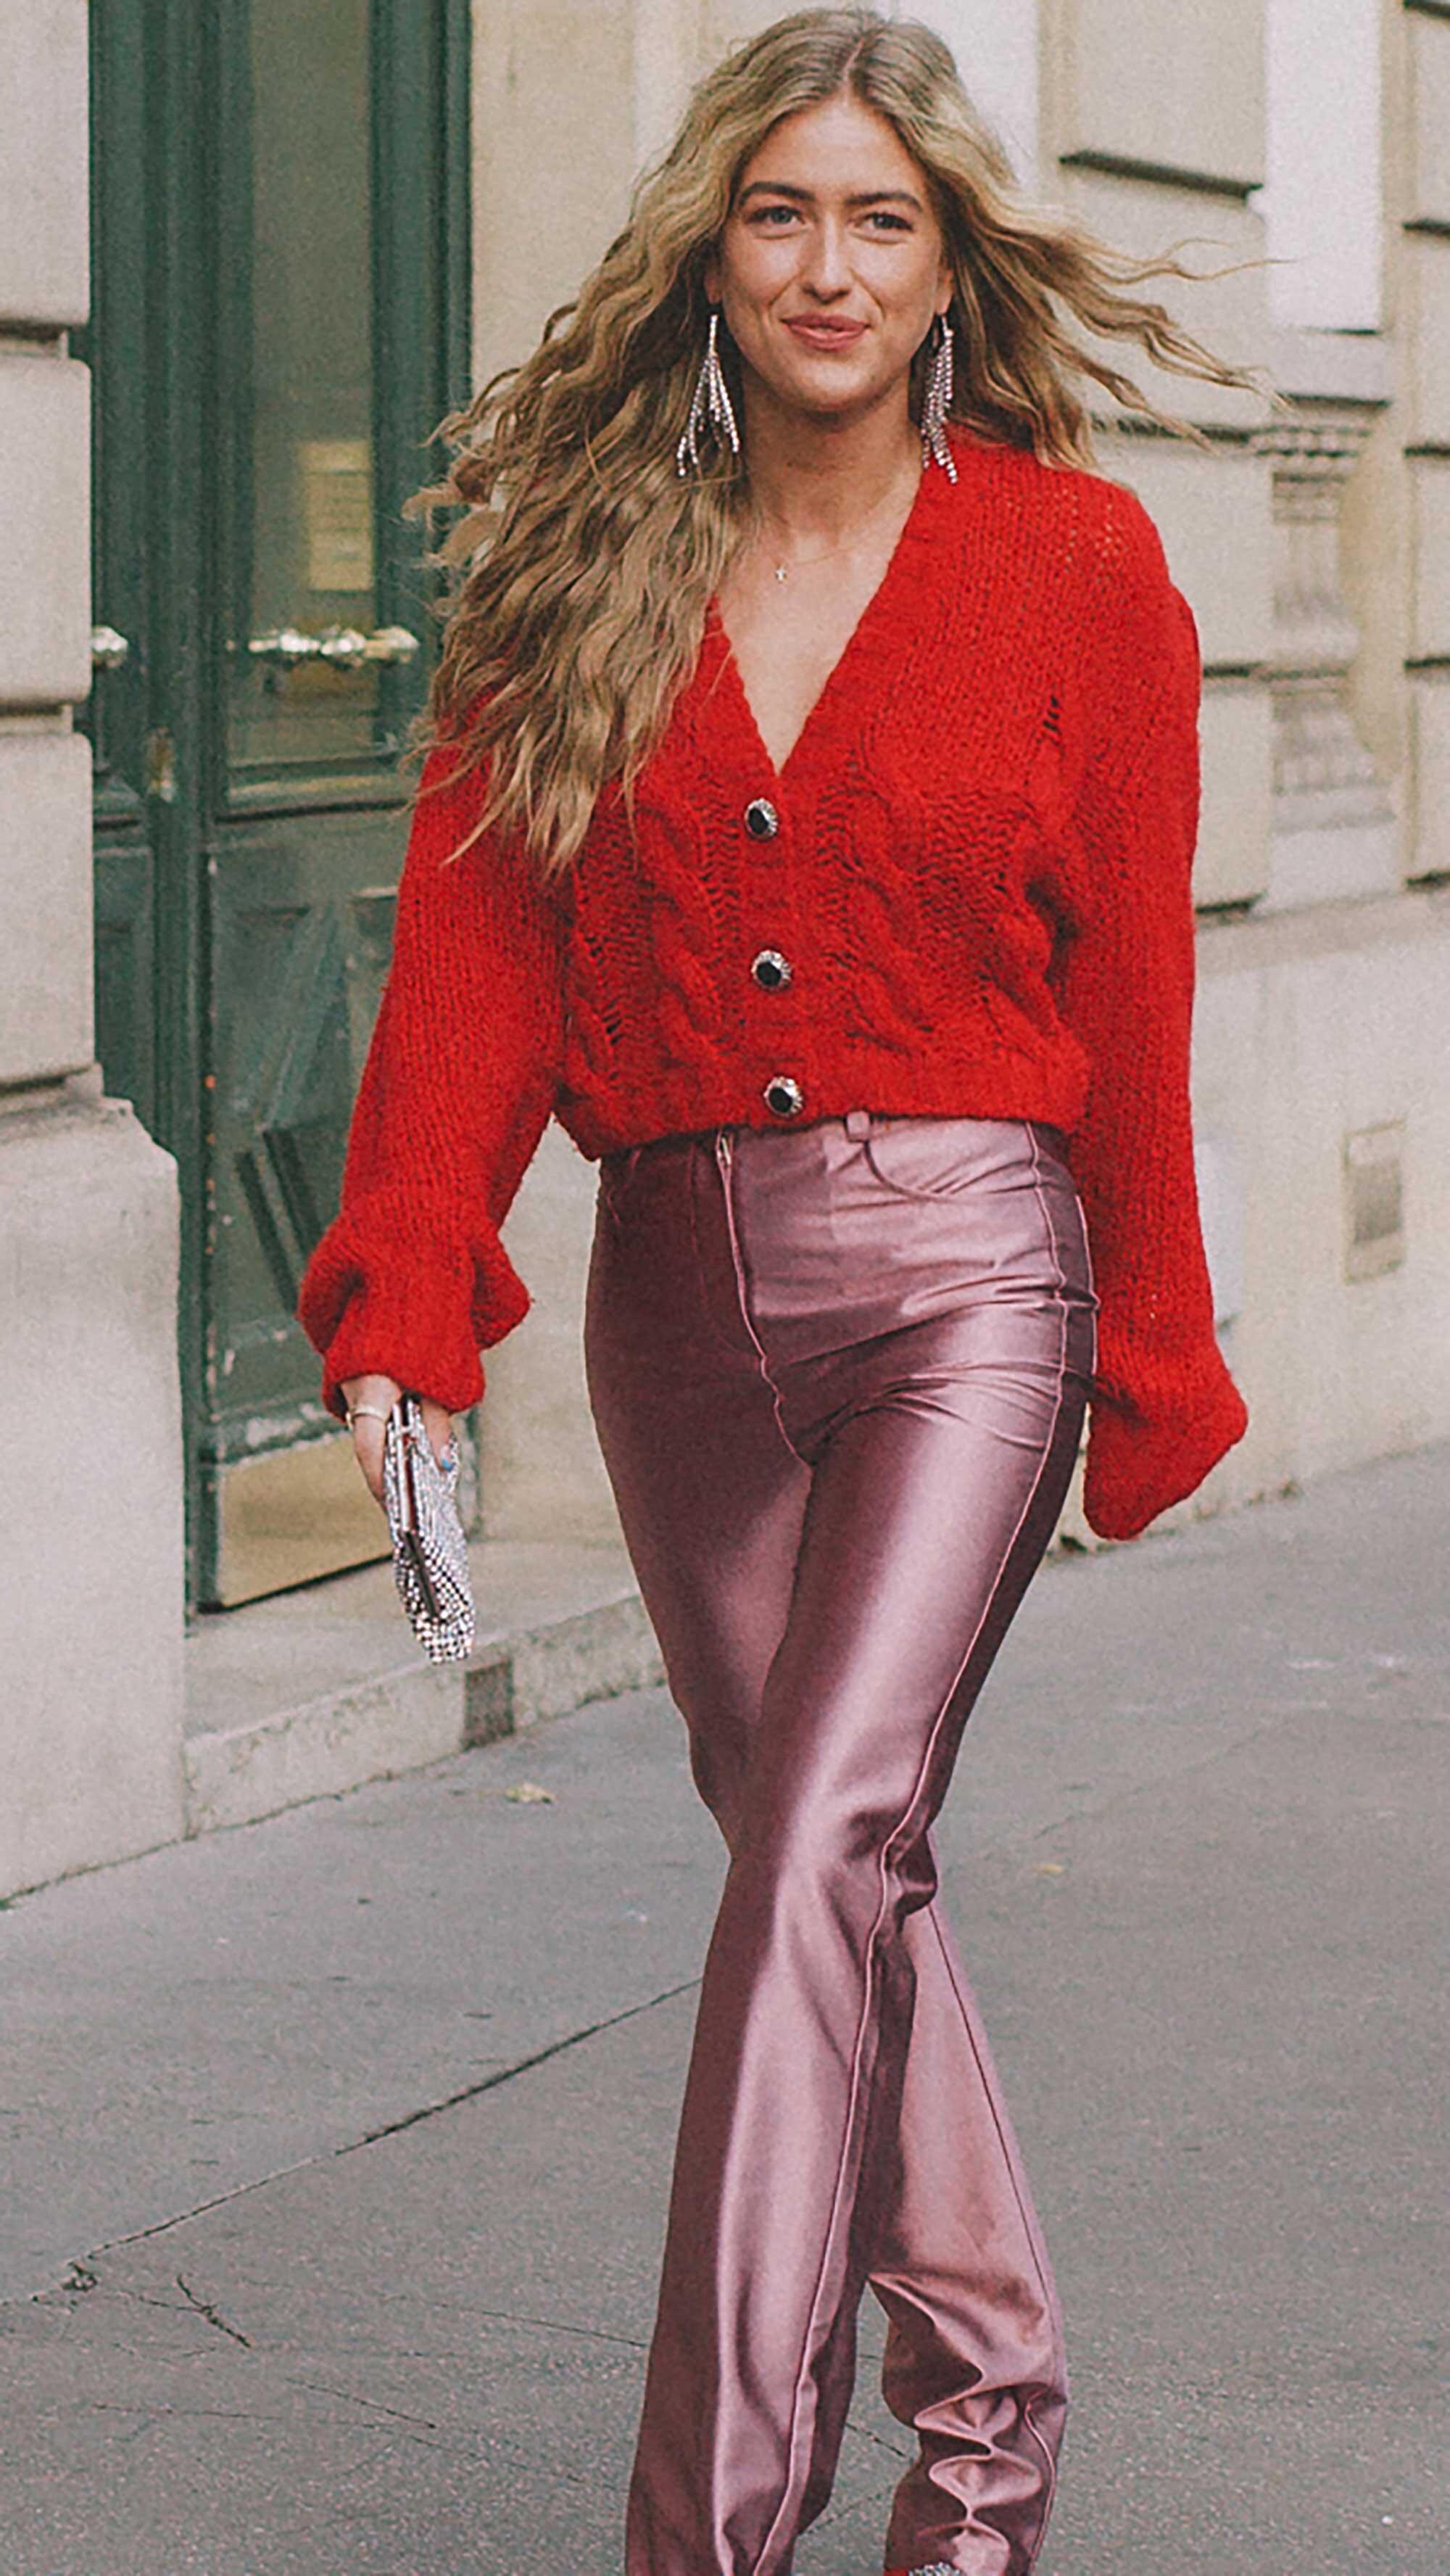 14. Alessandra Rich - Cropped knit cardigan